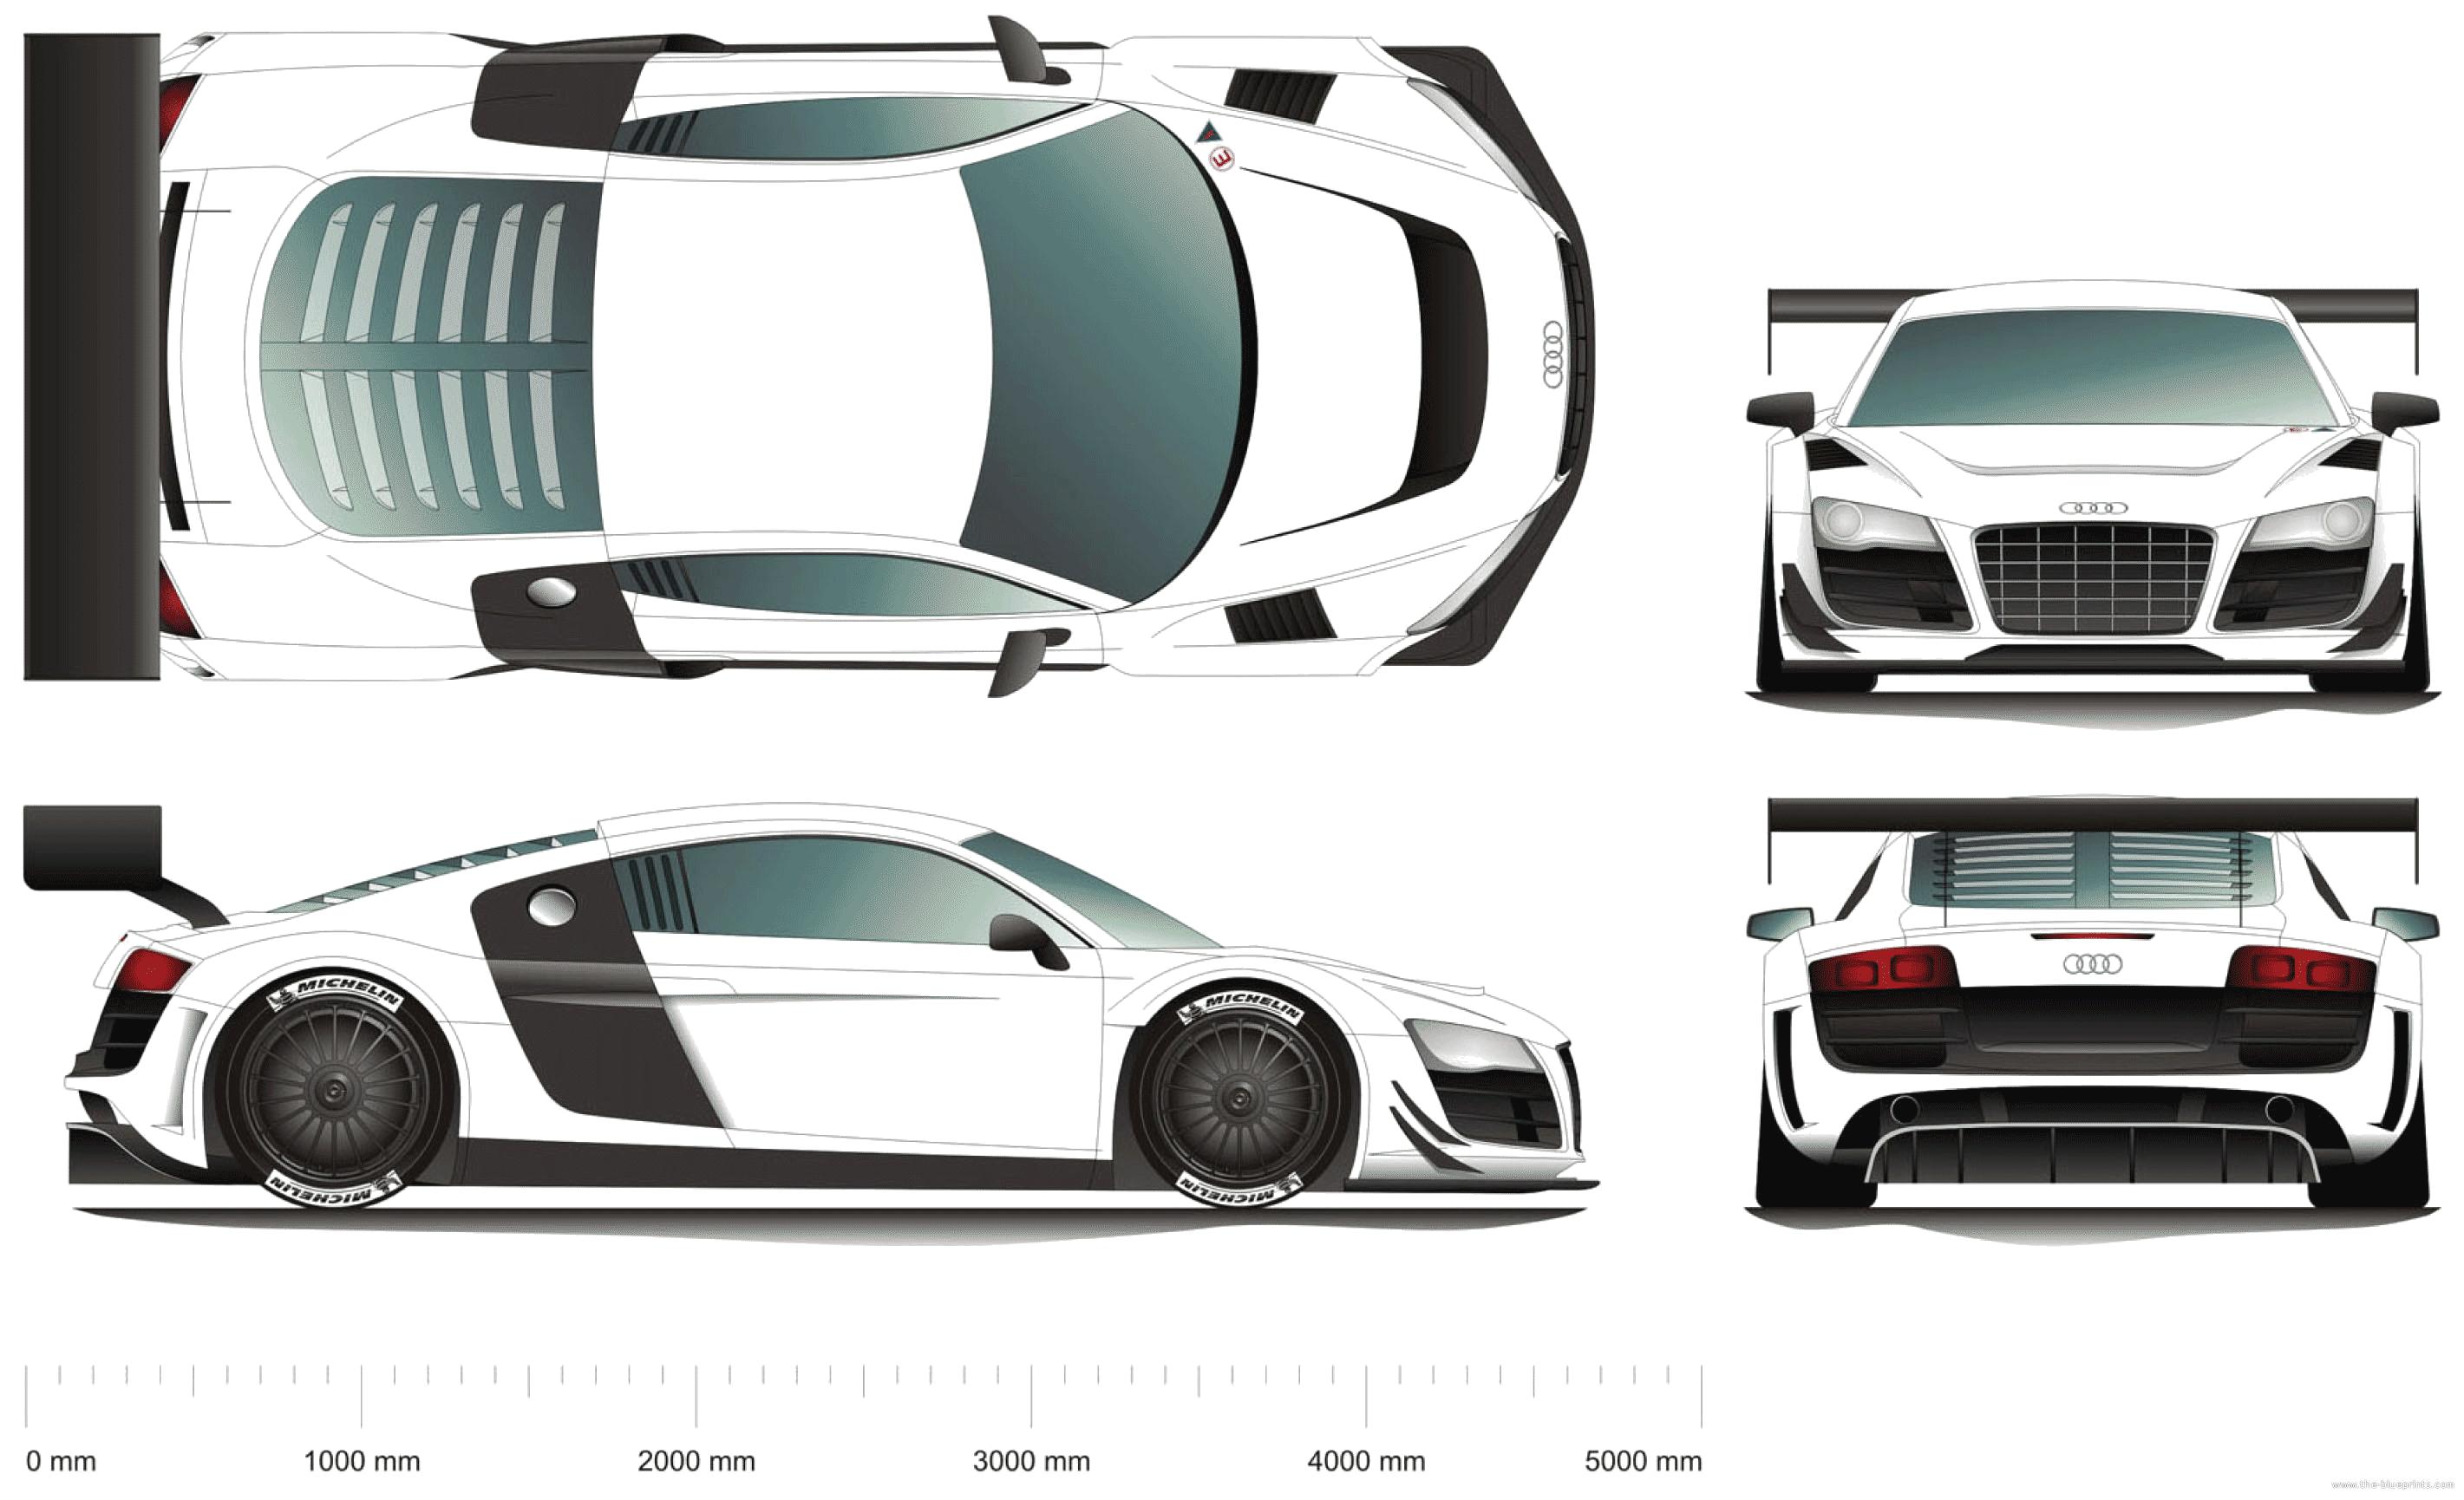 Solidworks tutorial :Modelling Audi R8 | GrabCAD Questions